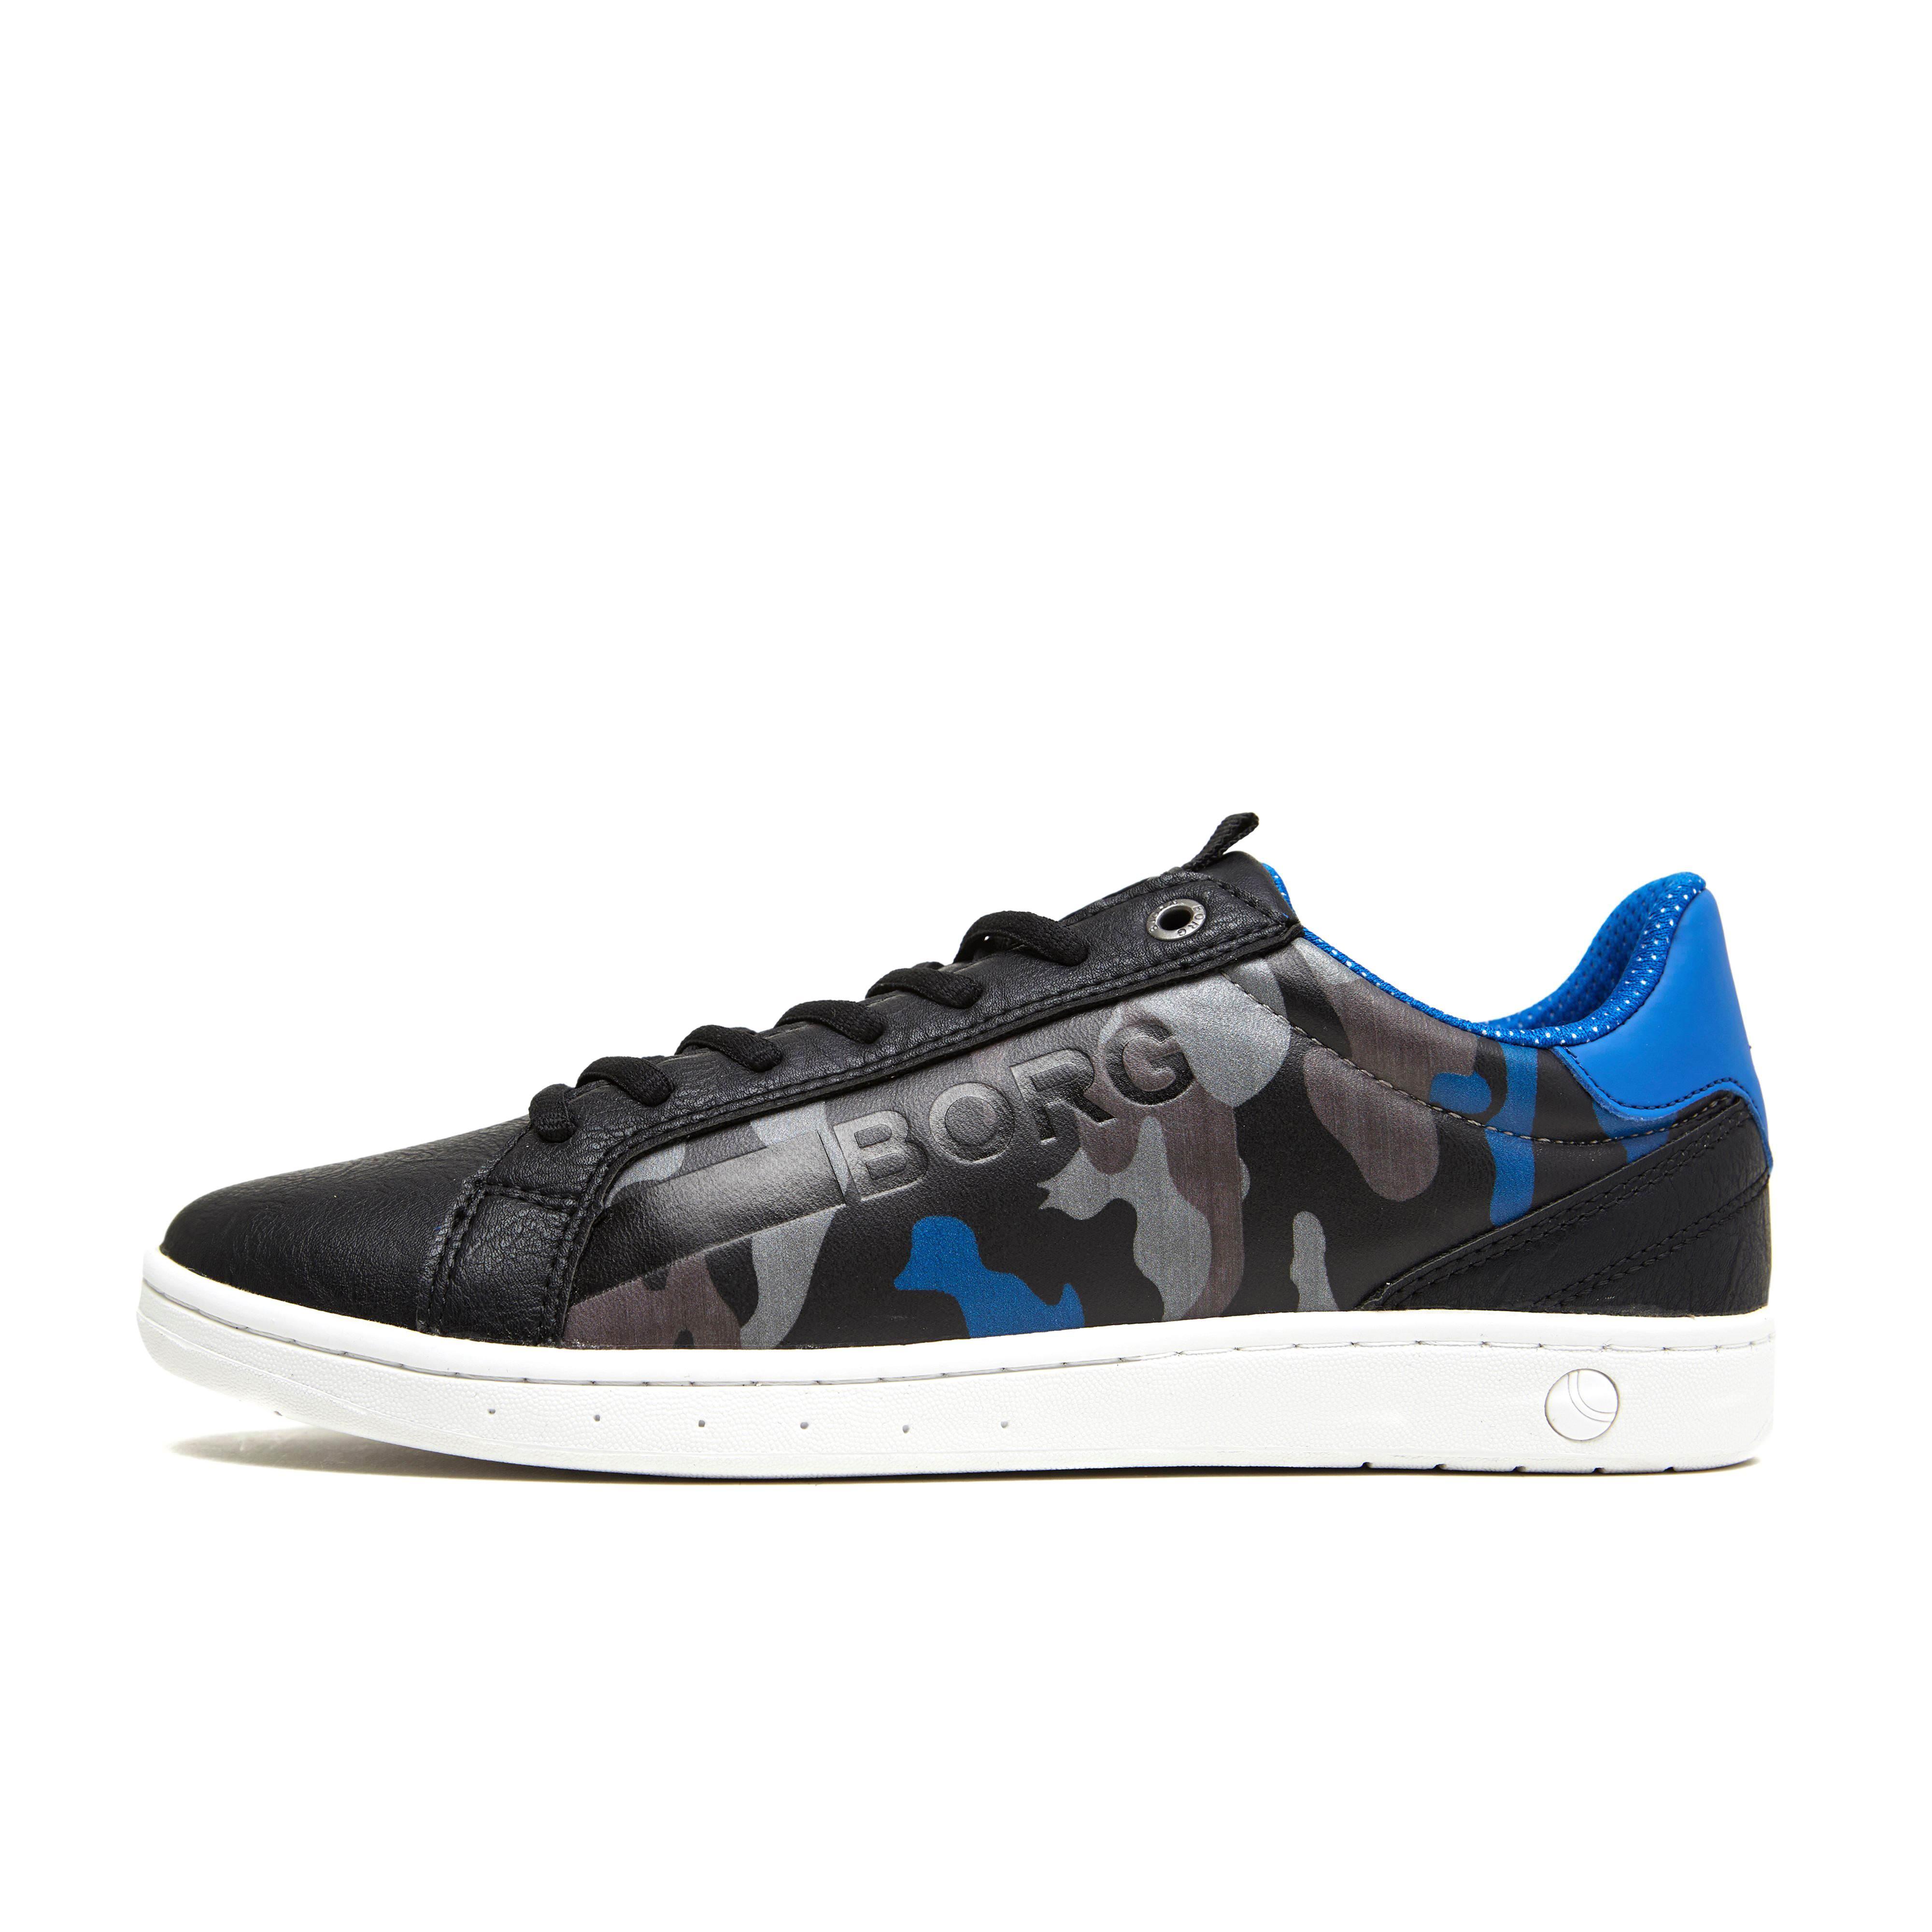 2ee0bceb0cd Bjorn Borg schoenen jongens - Fashion For Less